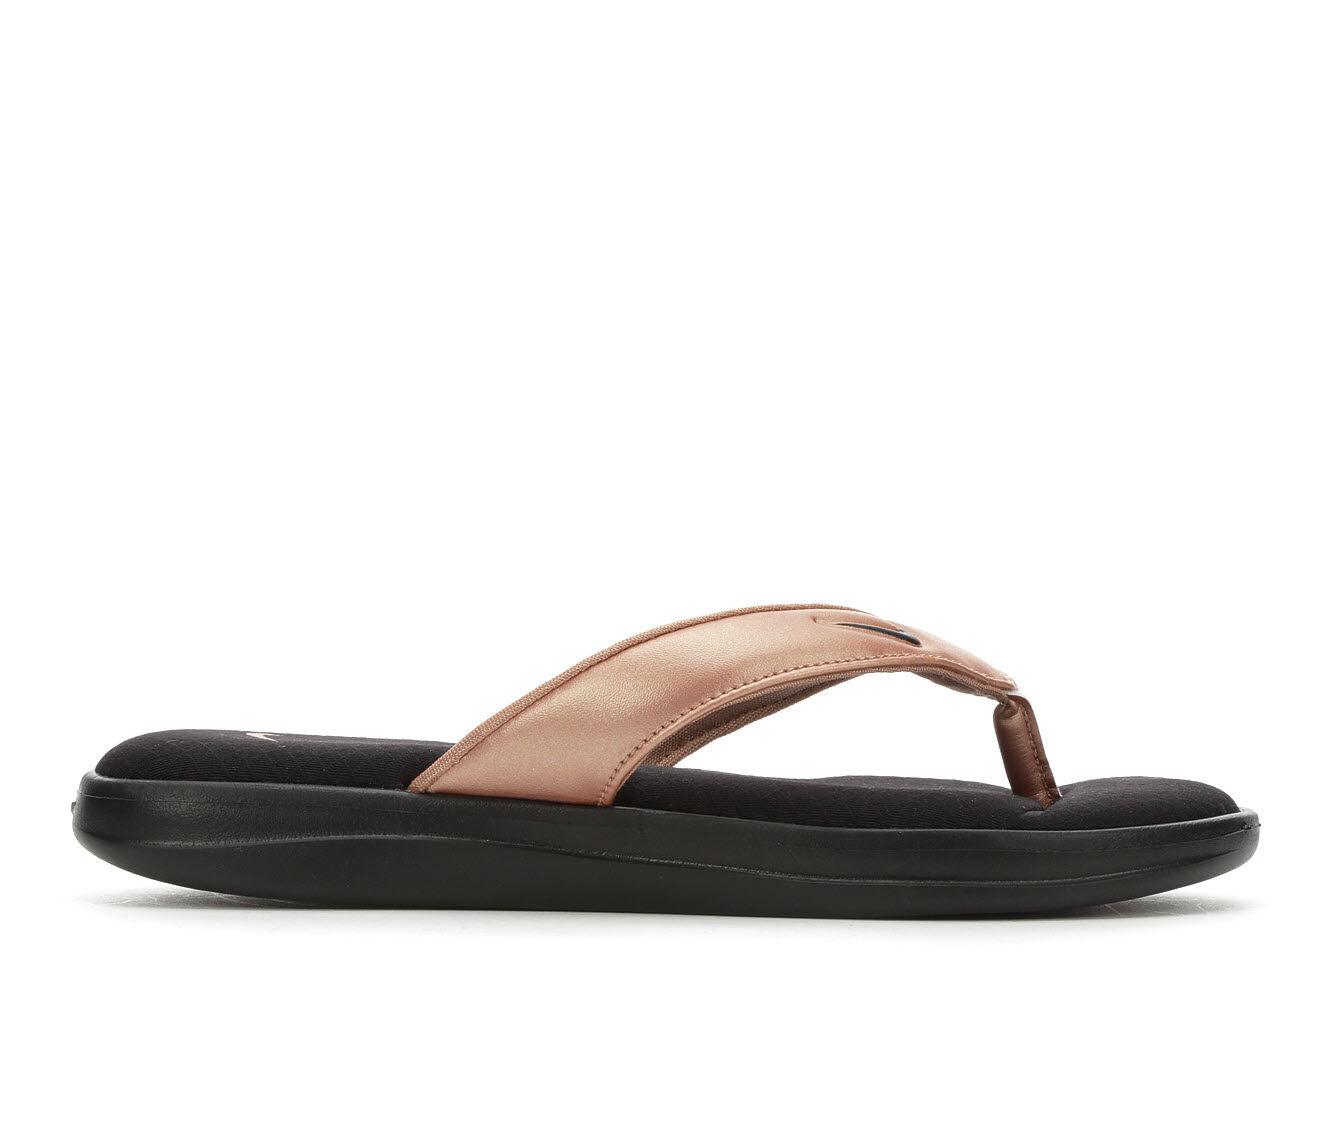 For Sale Popular Women's Nike Ultra Comfort Thong 3 Sport Sandals Black/MTLC Brnz